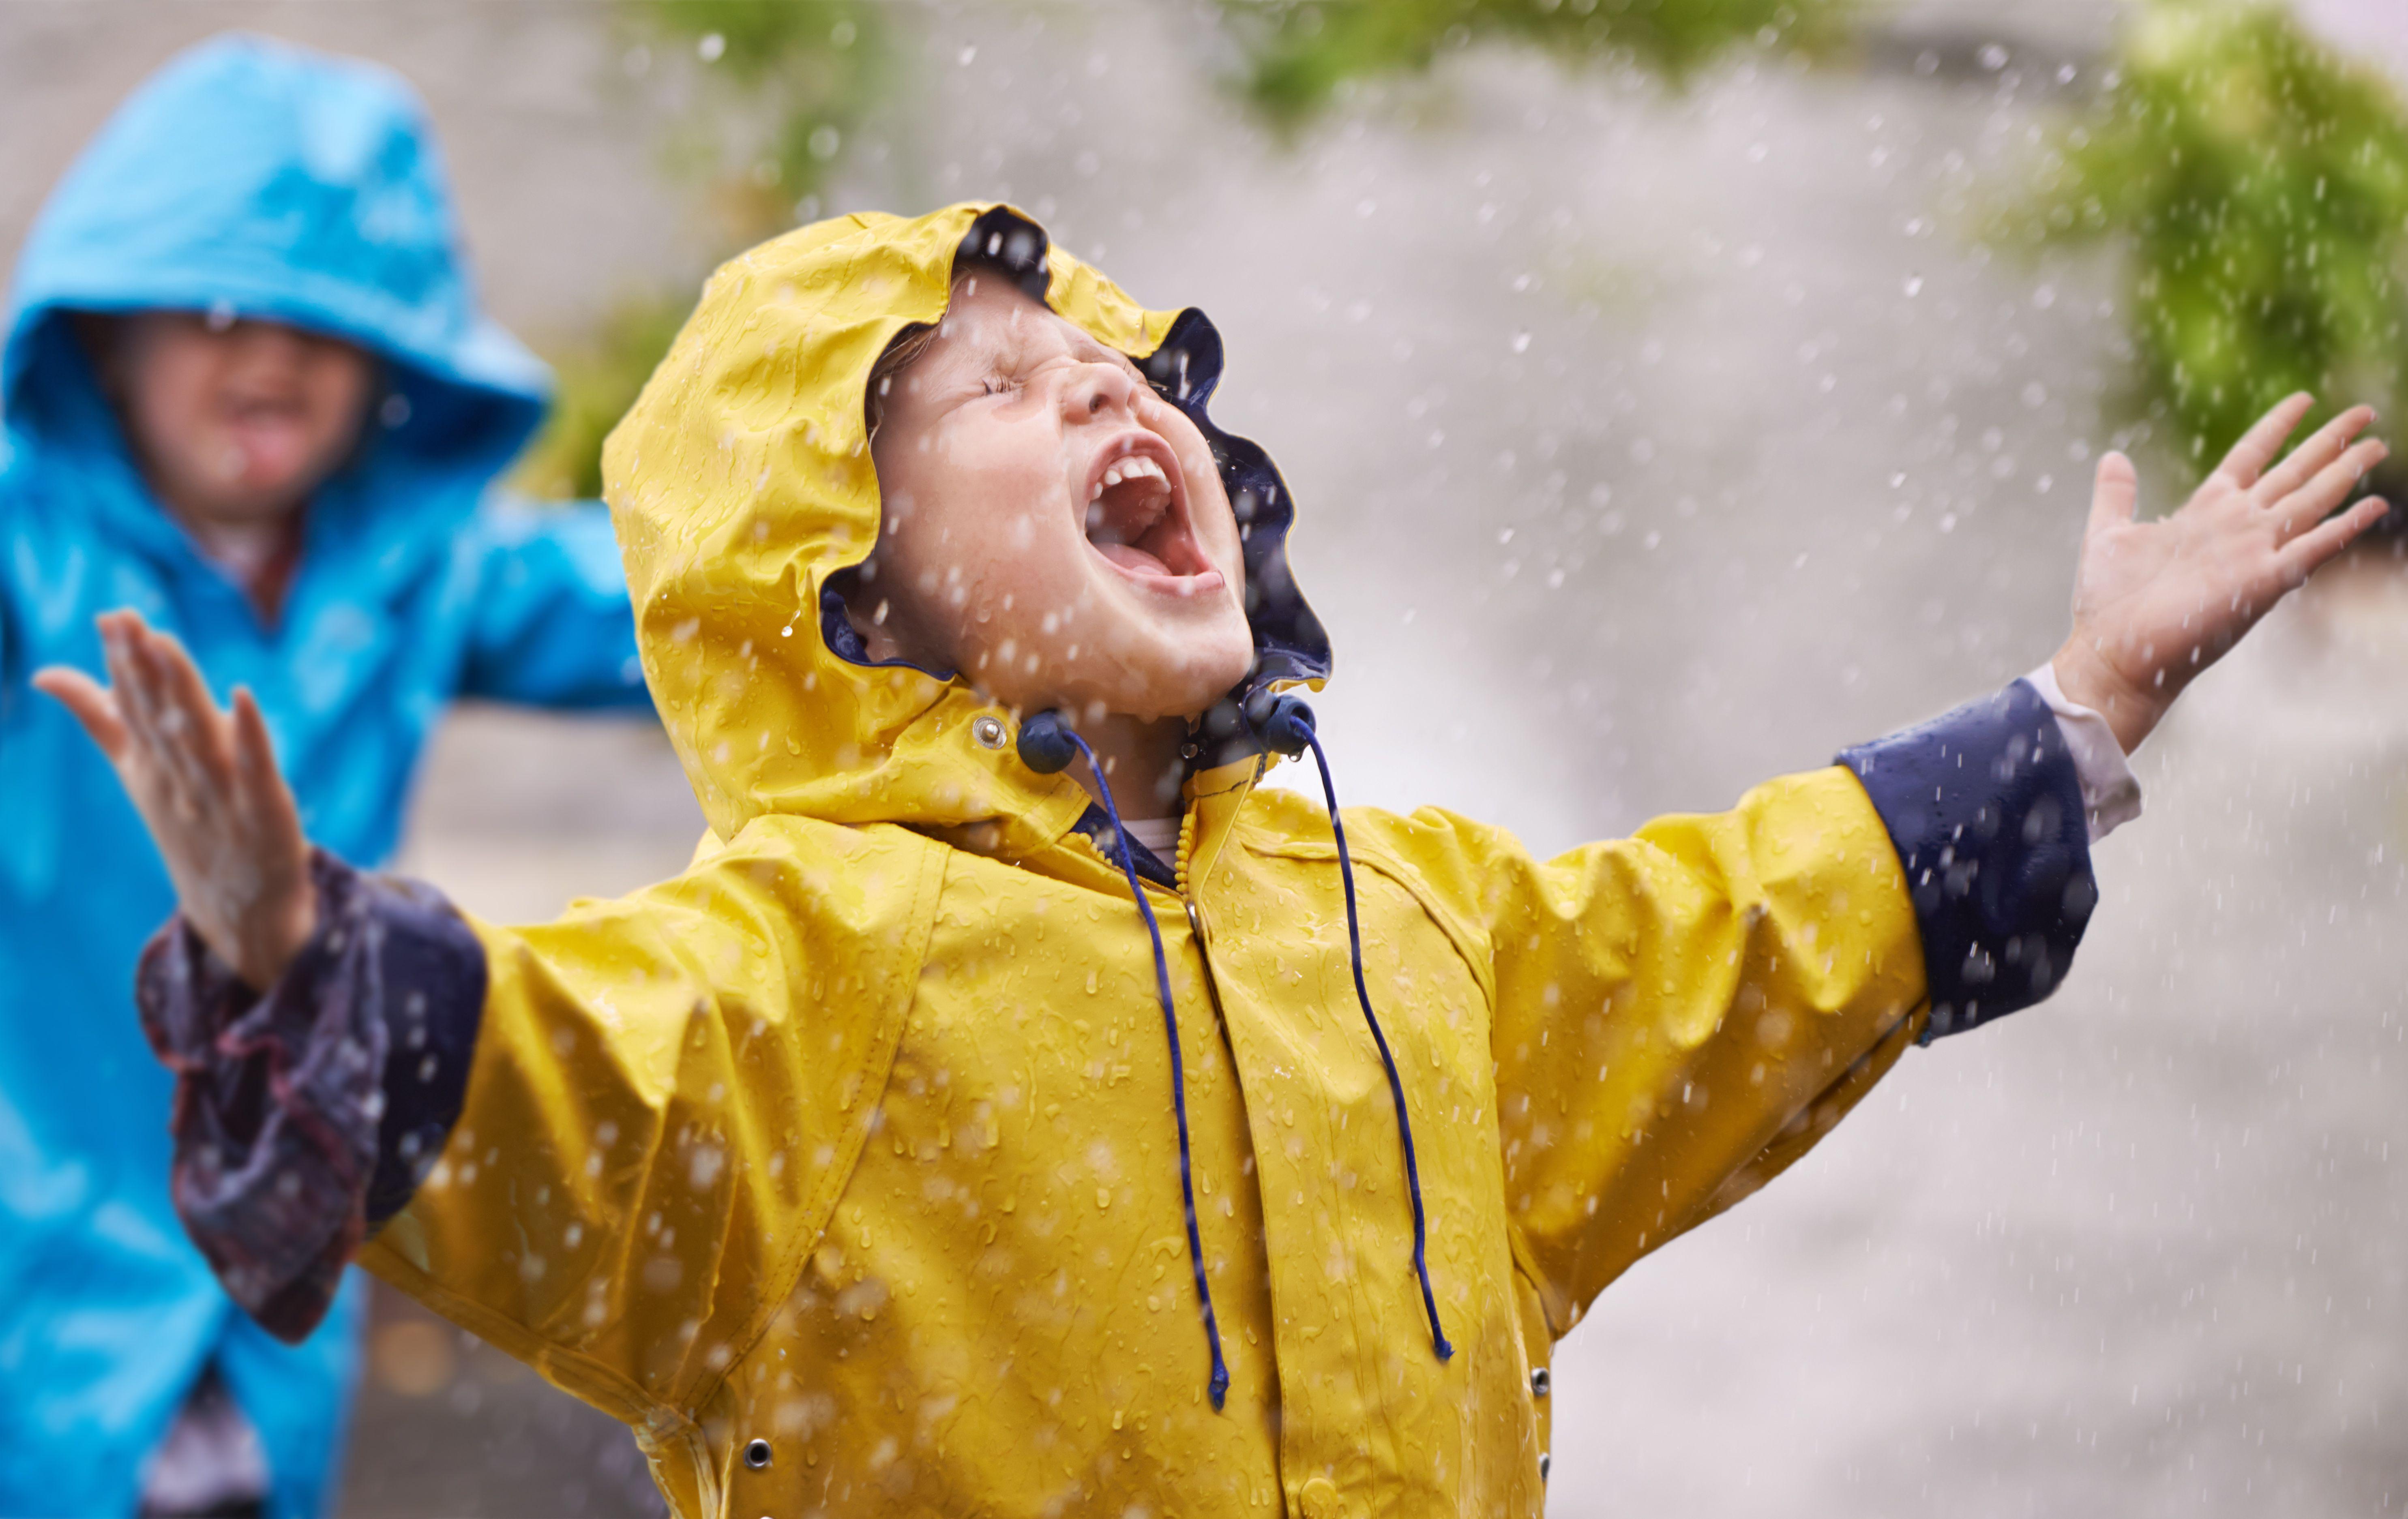 Rainy Day Outdoor Activities